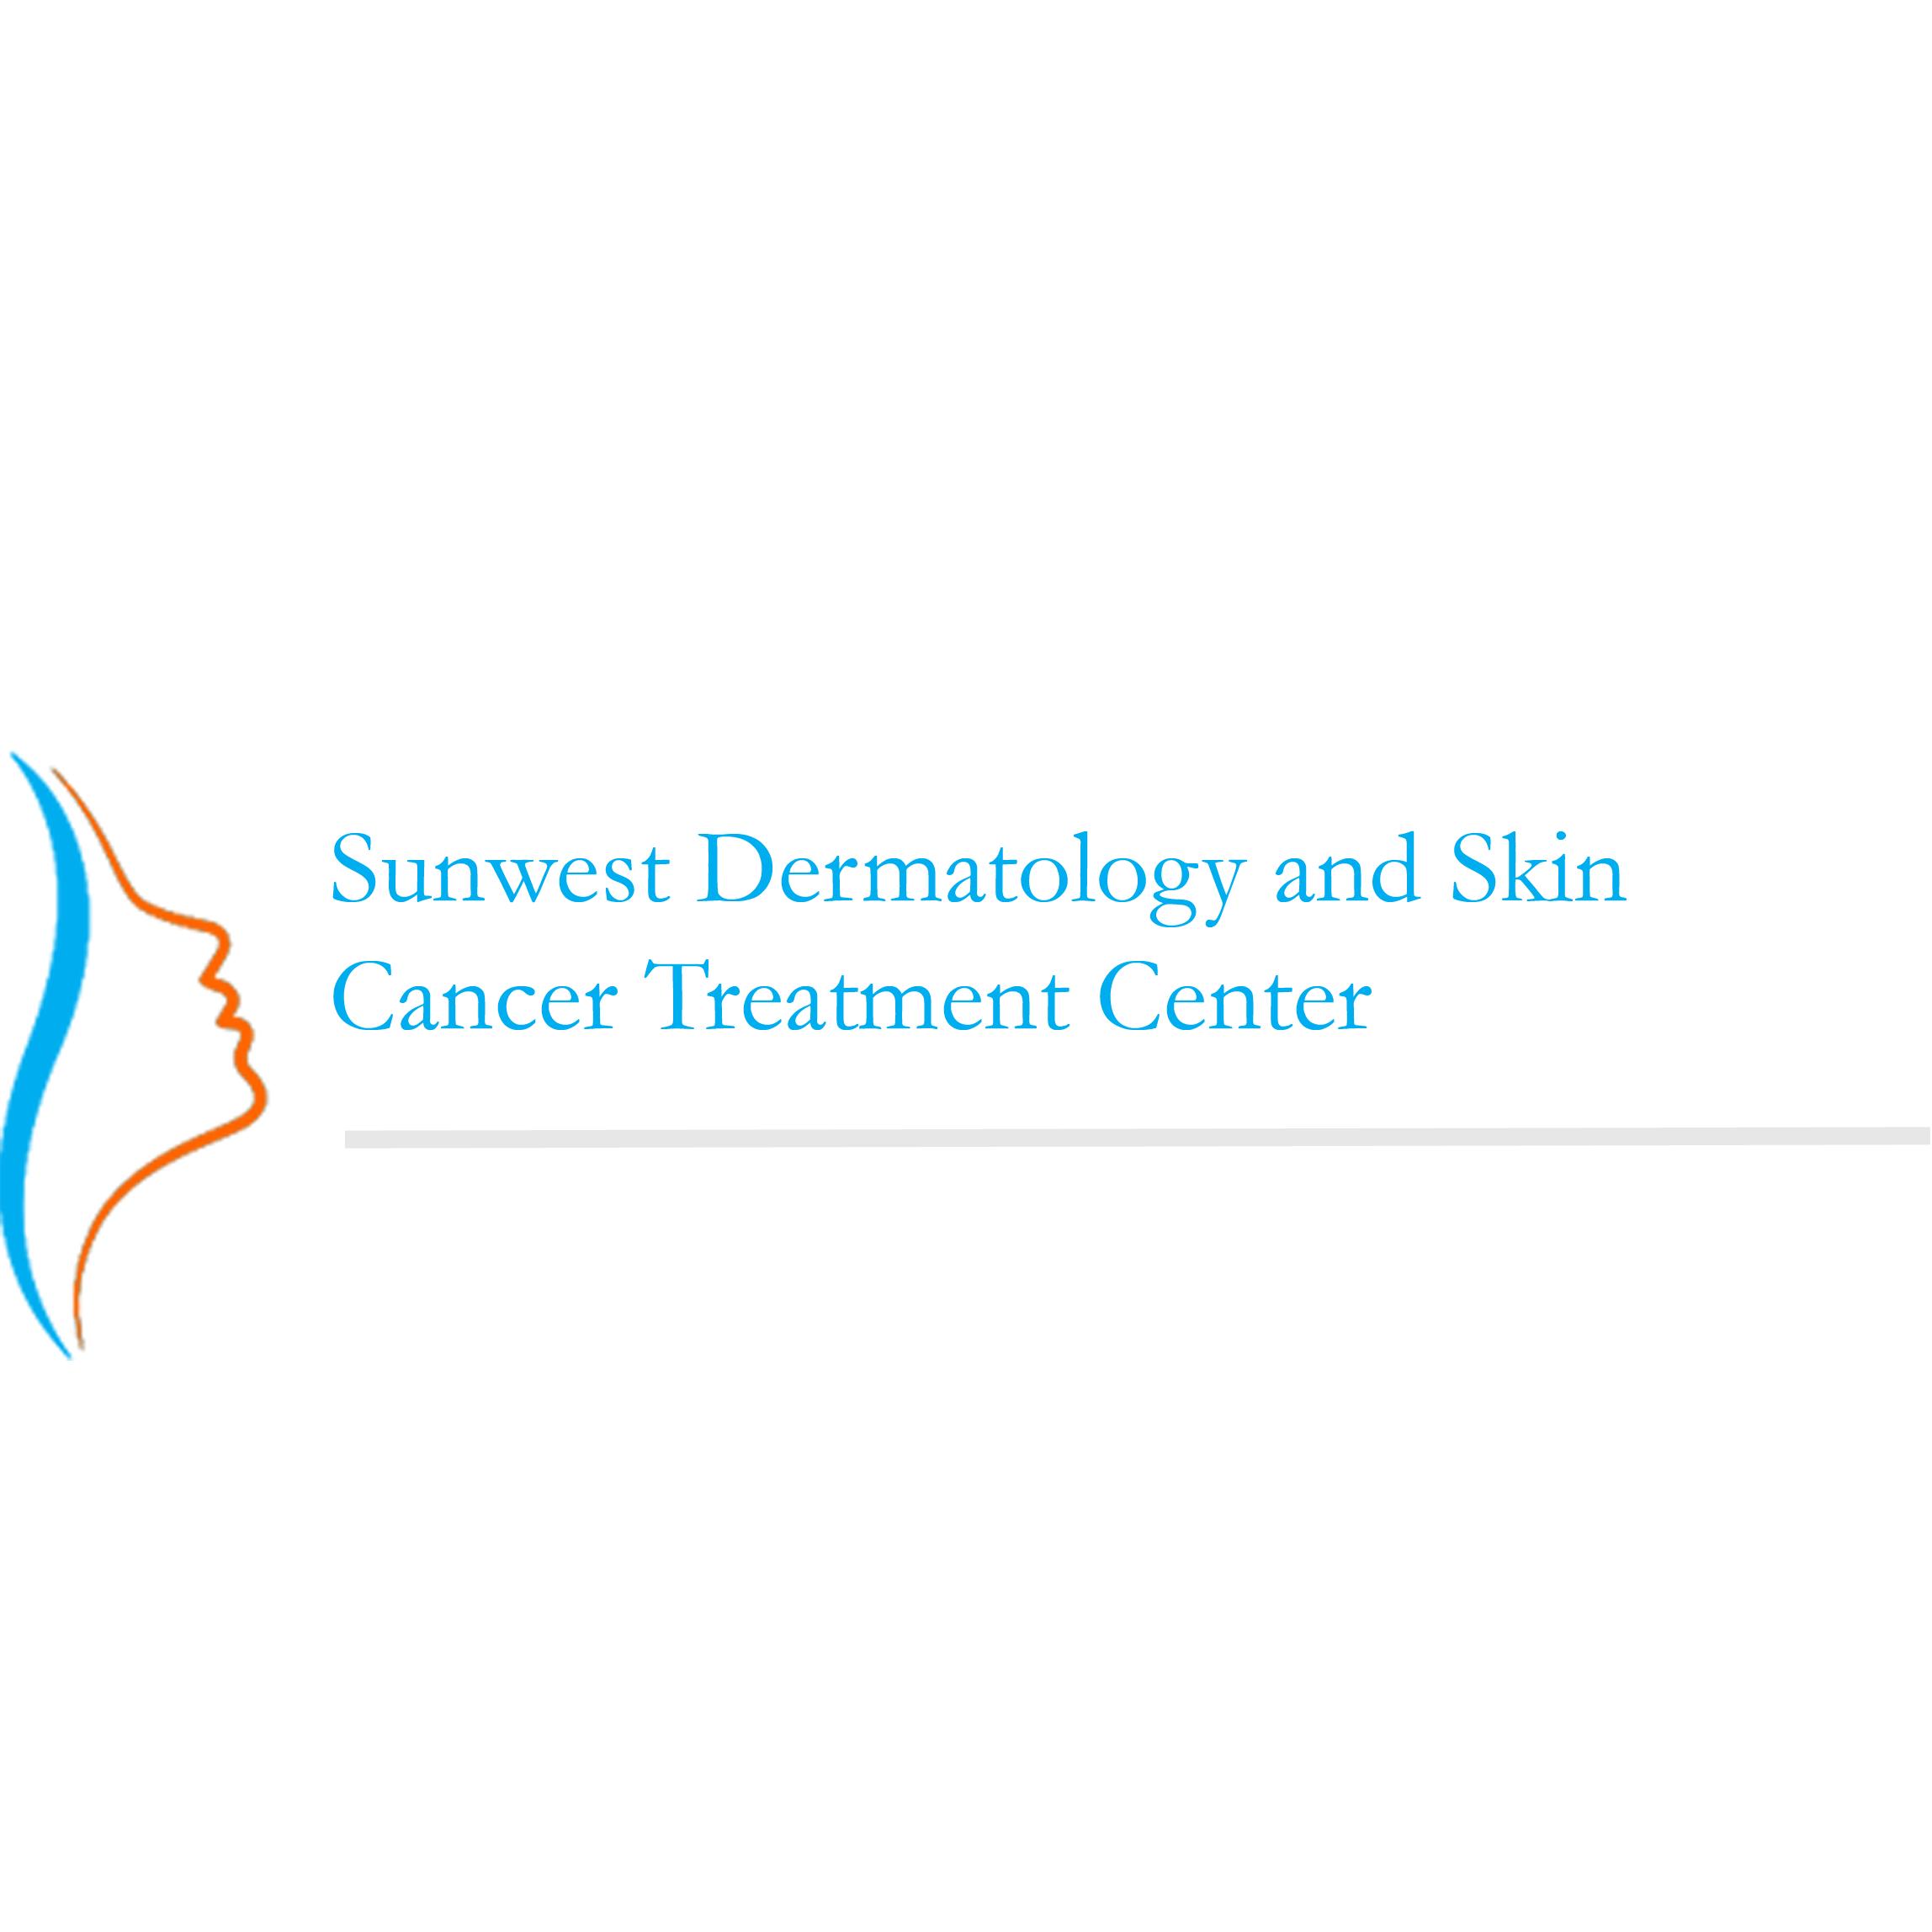 Sunwest Dermatology and Skin Cancer Treatment Center